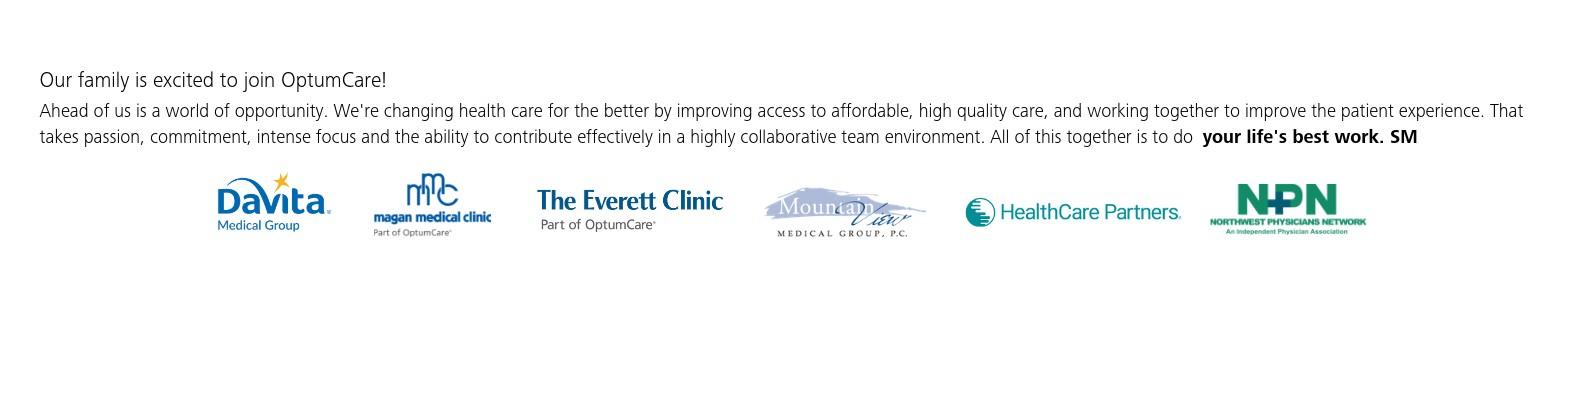 JSA Healthcare Corporation, A DaVita Medical Group   LinkedIn